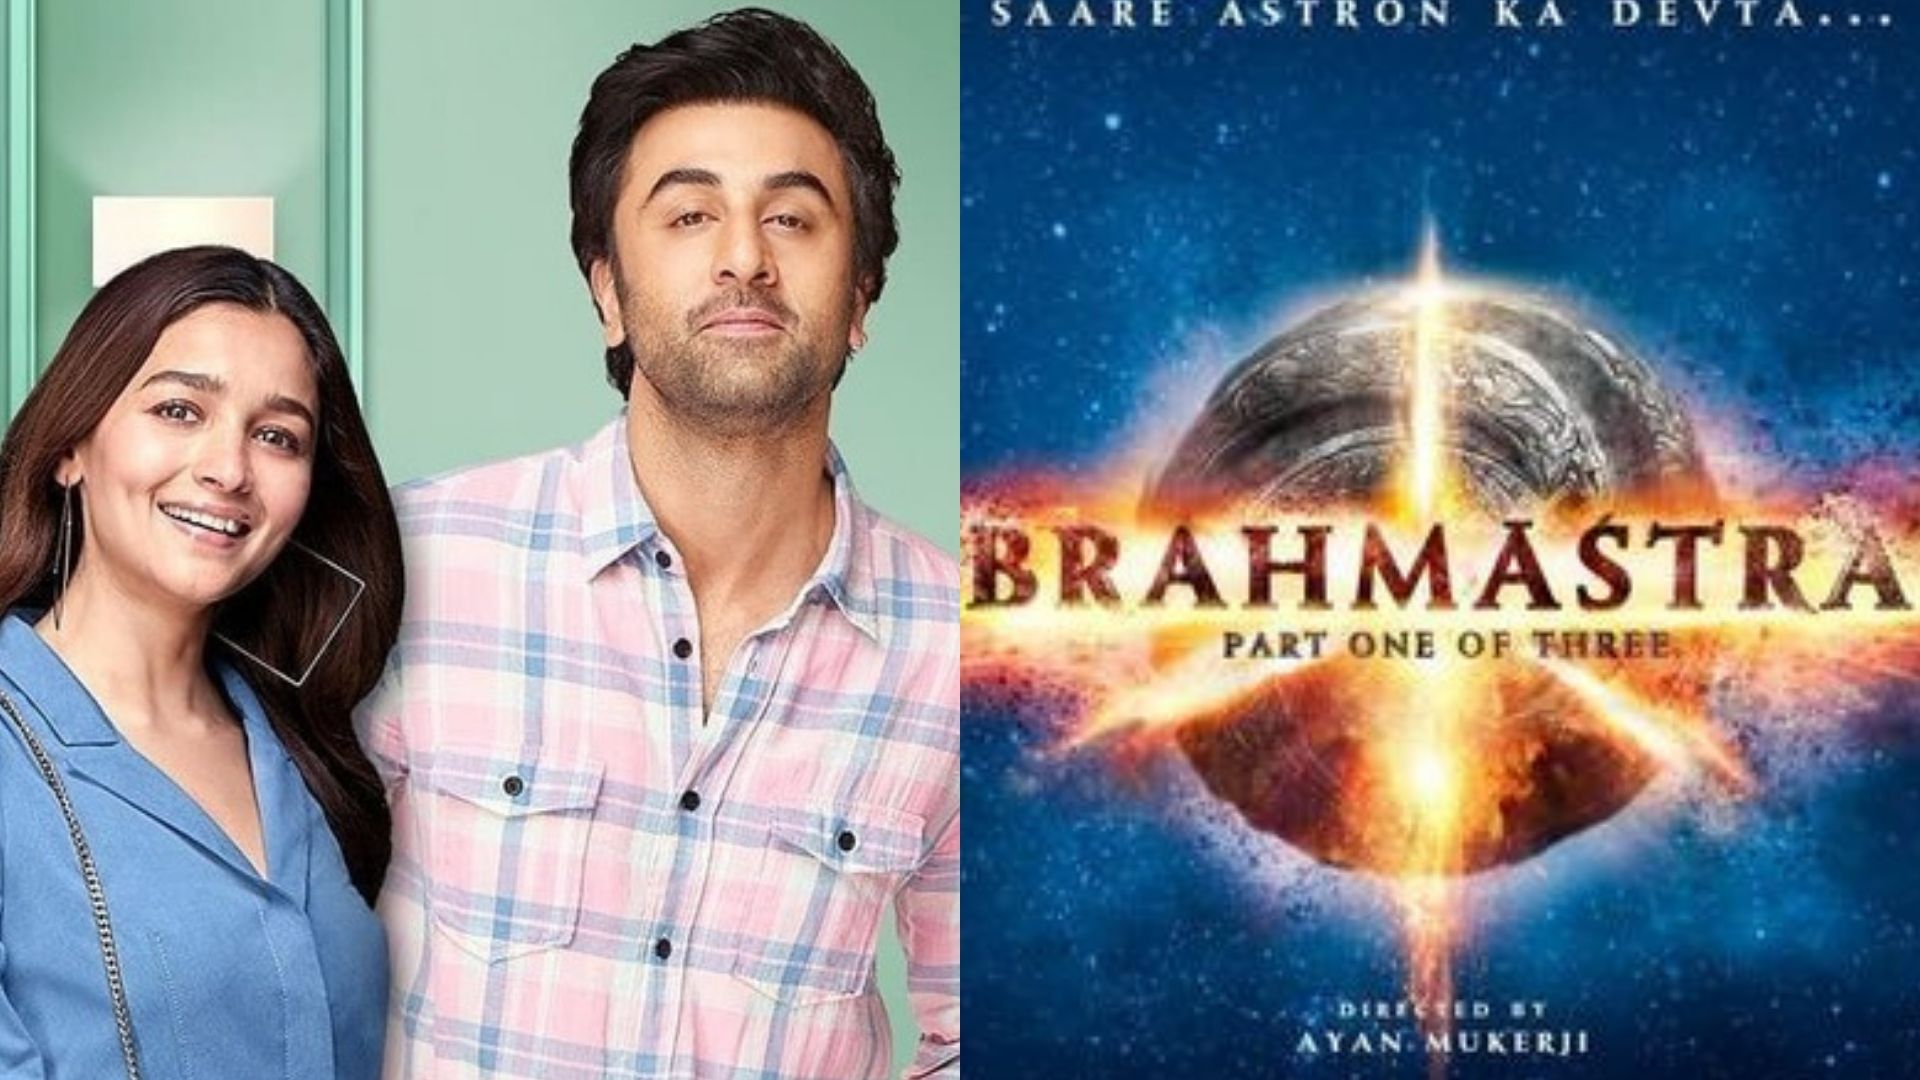 Brahmastra Update: Ranbir Kapoor To Shoot For An Interesting Portion Of The Film; Will Alia Bhatt Accompany Him? – Deets Inside